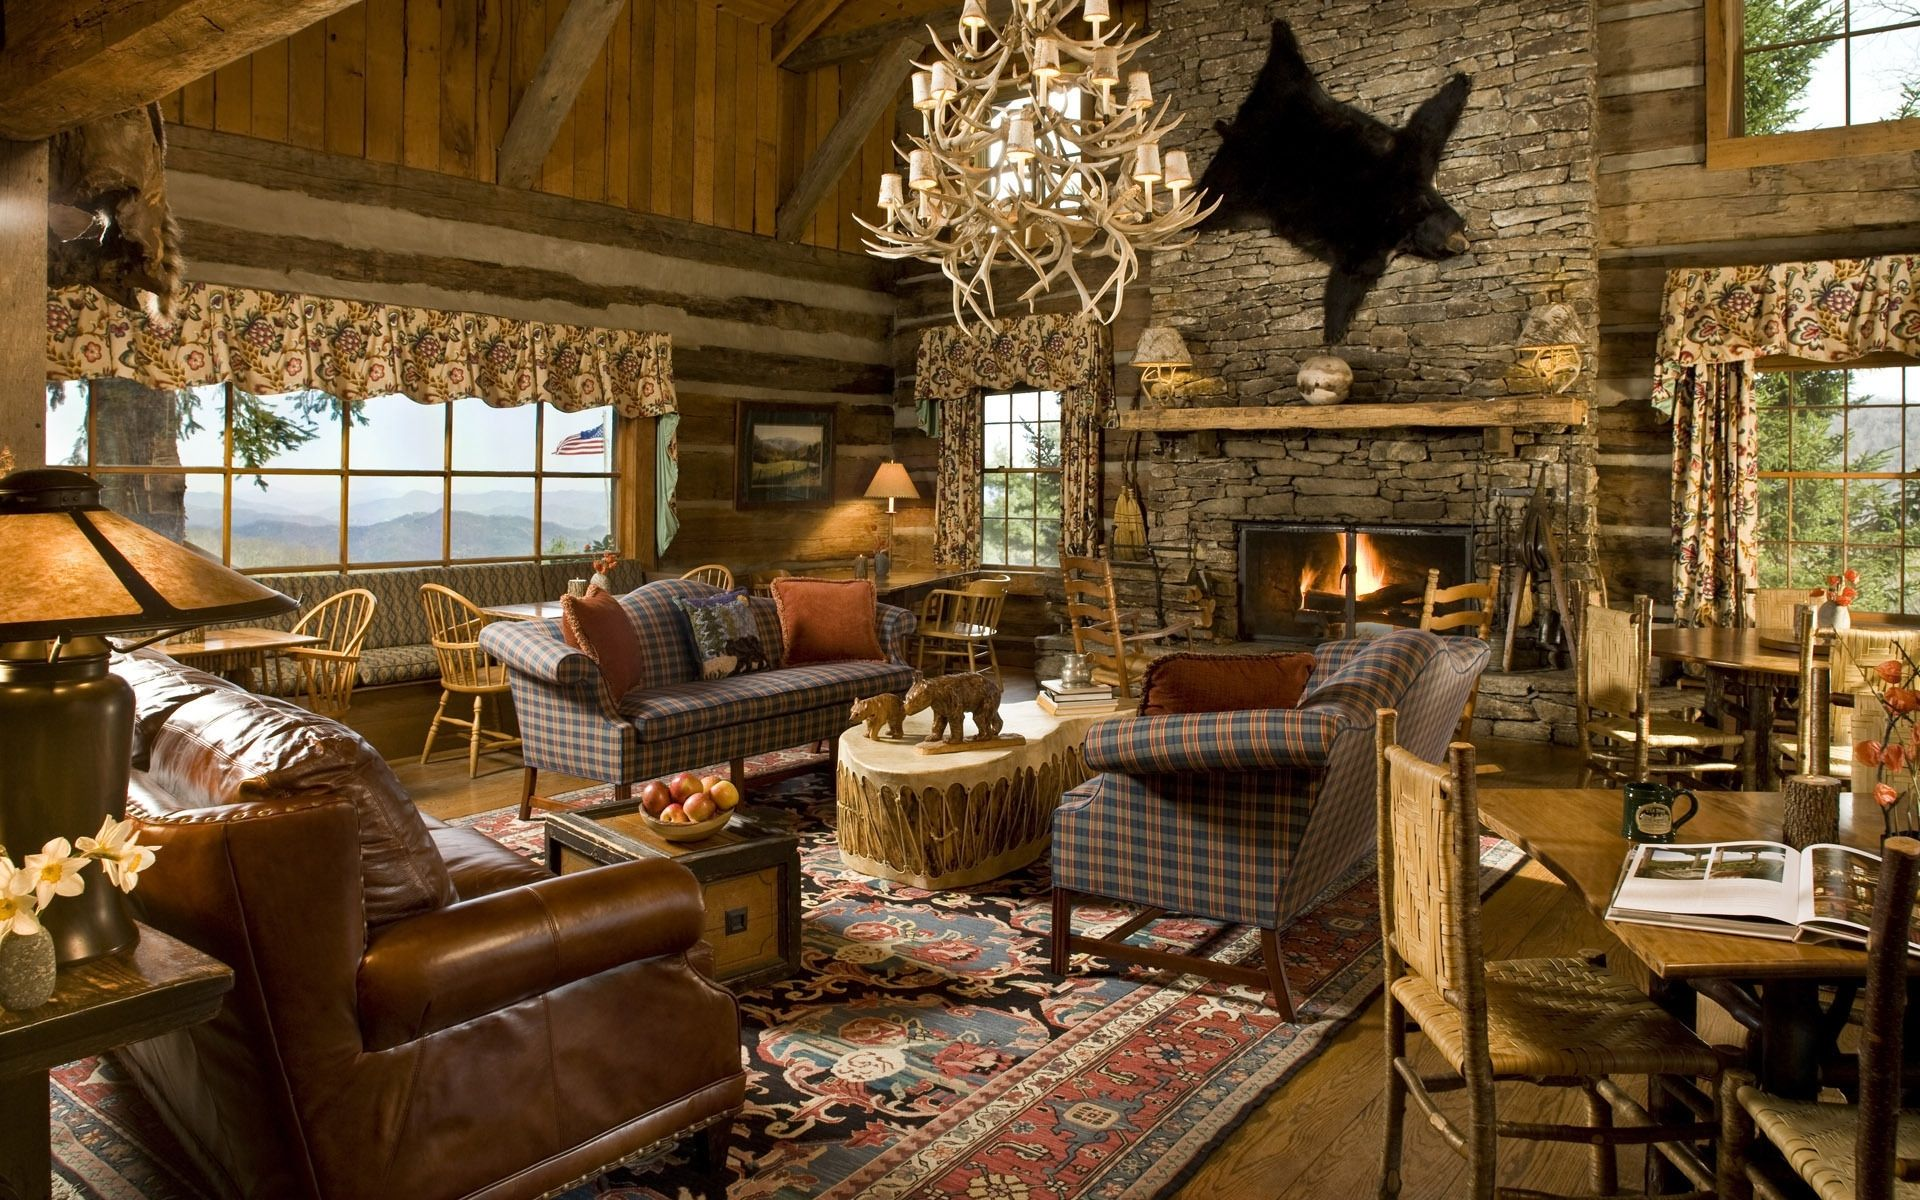 Mountain cottage interior designs 8 image post mountain cottage interior design plans